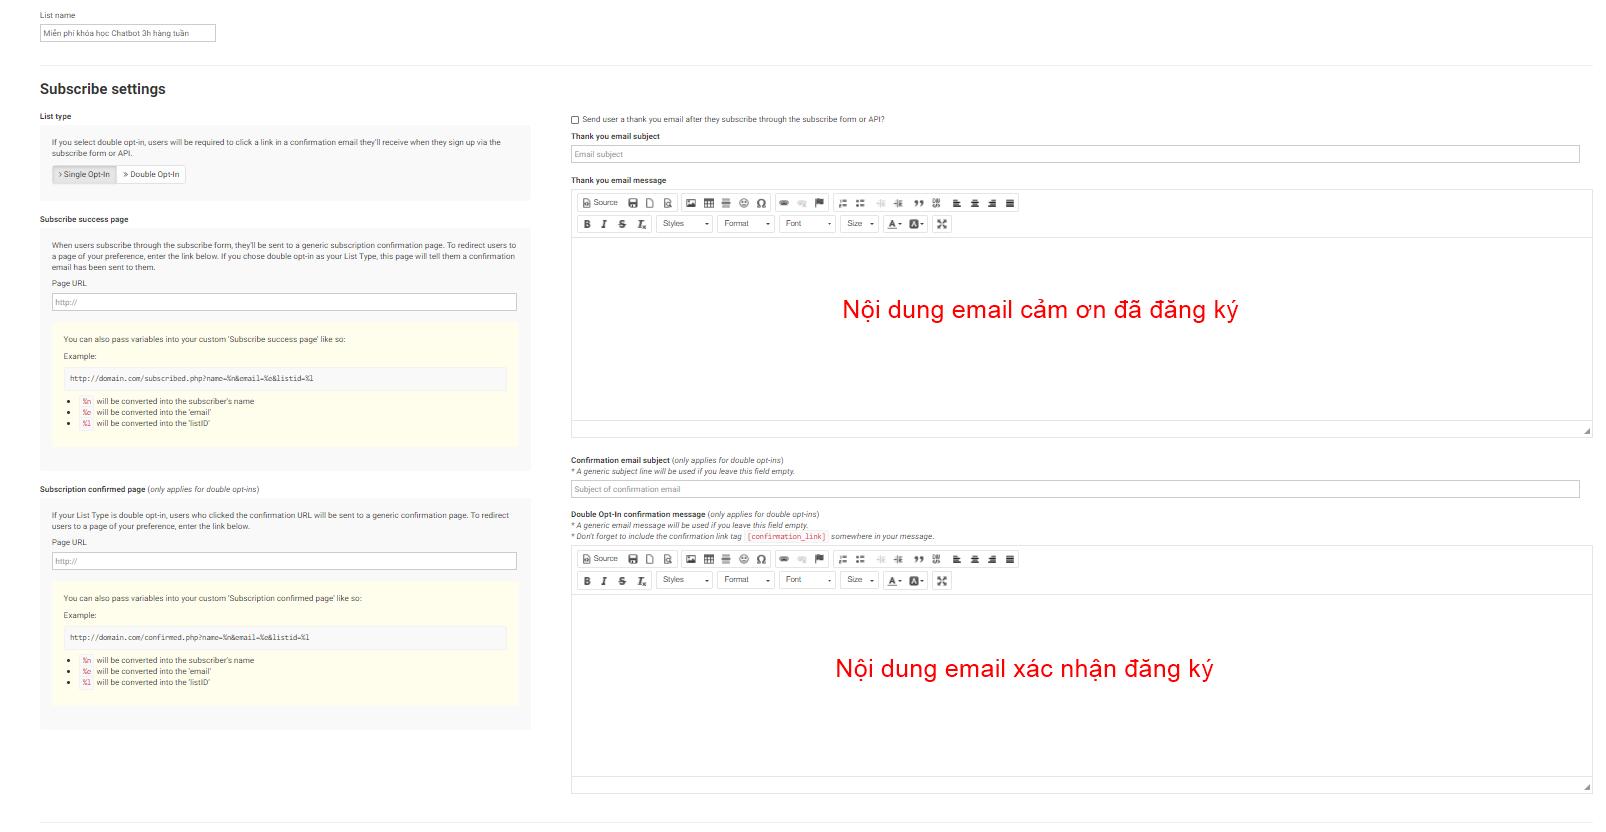 huong-dan-cai-dat-email-marketing-sendy-tu-a-den-z-nammark-7